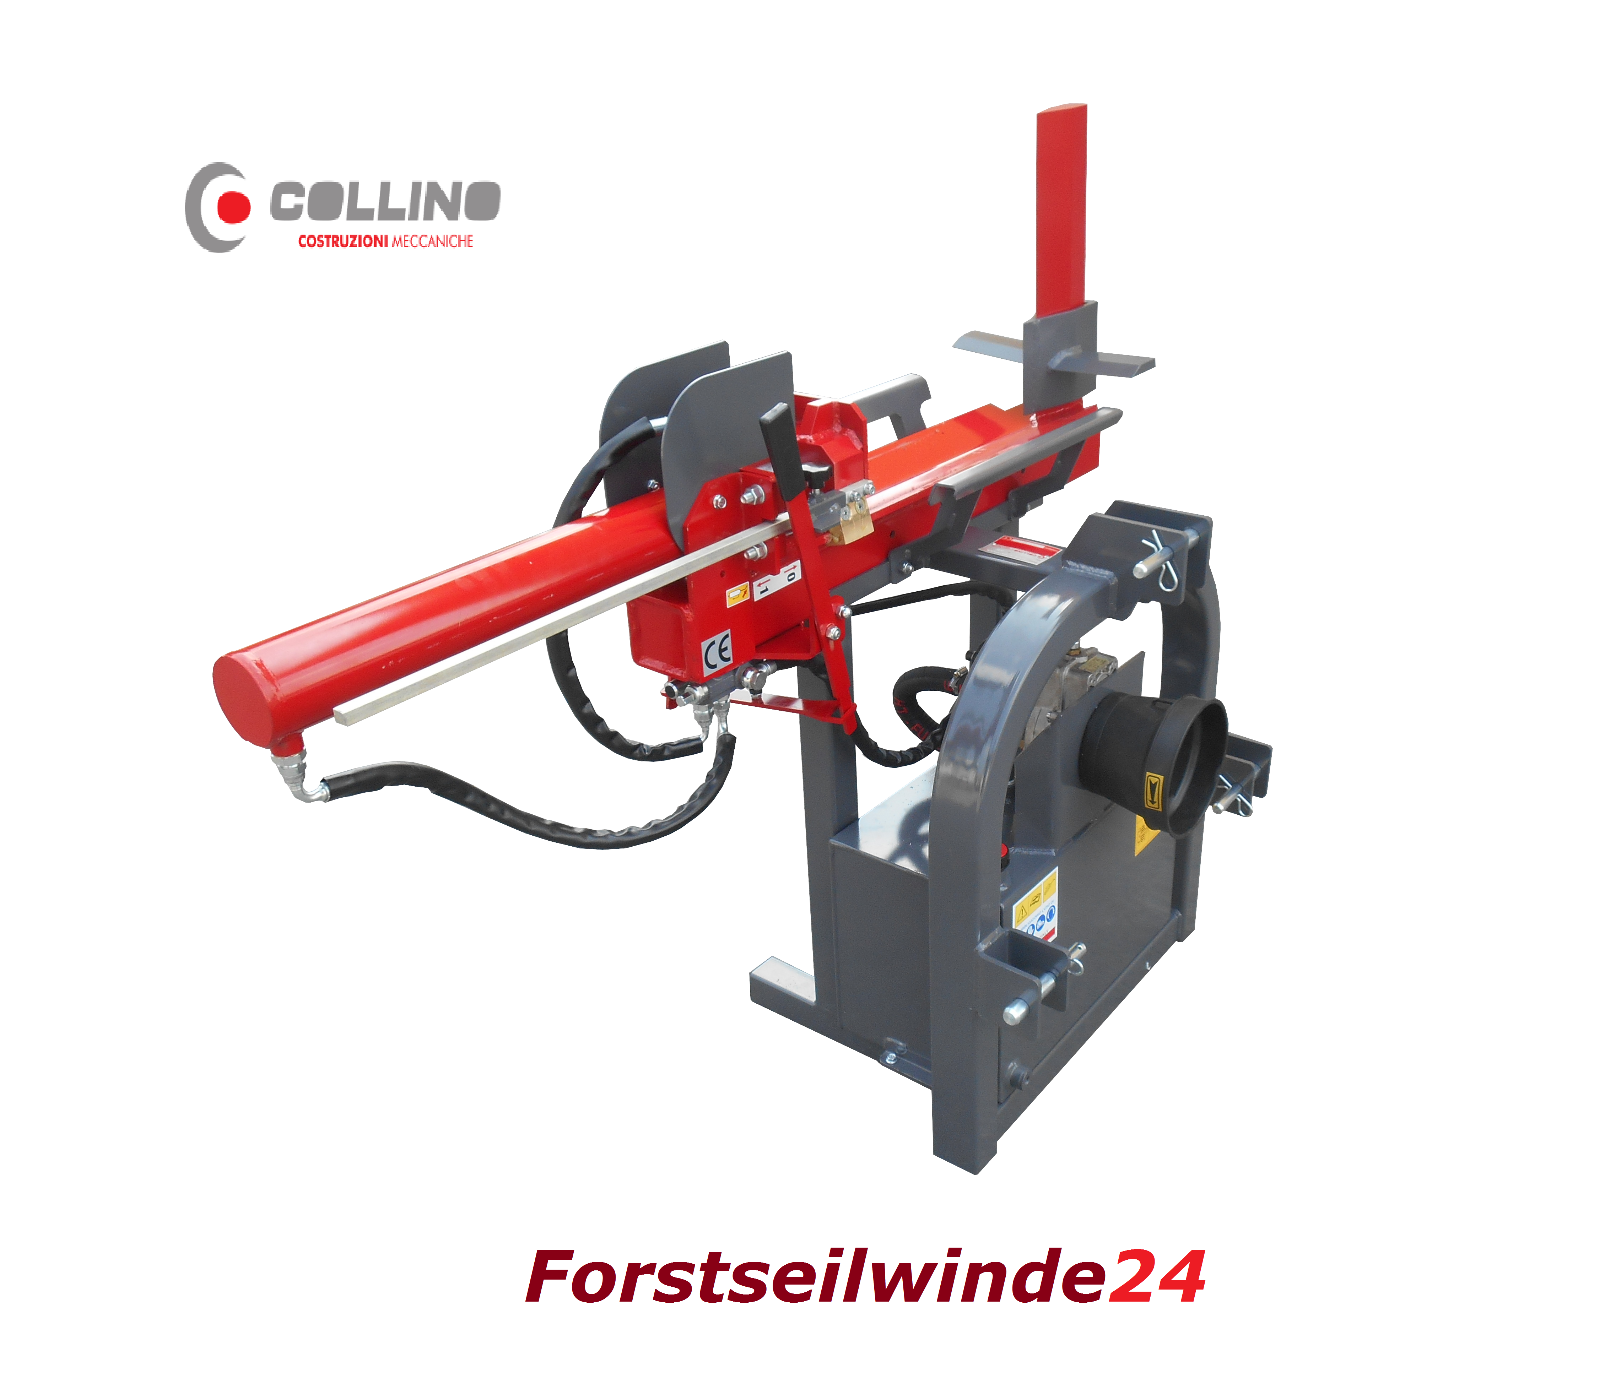 Holzspalter Collino Speedy 15 t Profi Holzspalter liegend - Made in Italy -